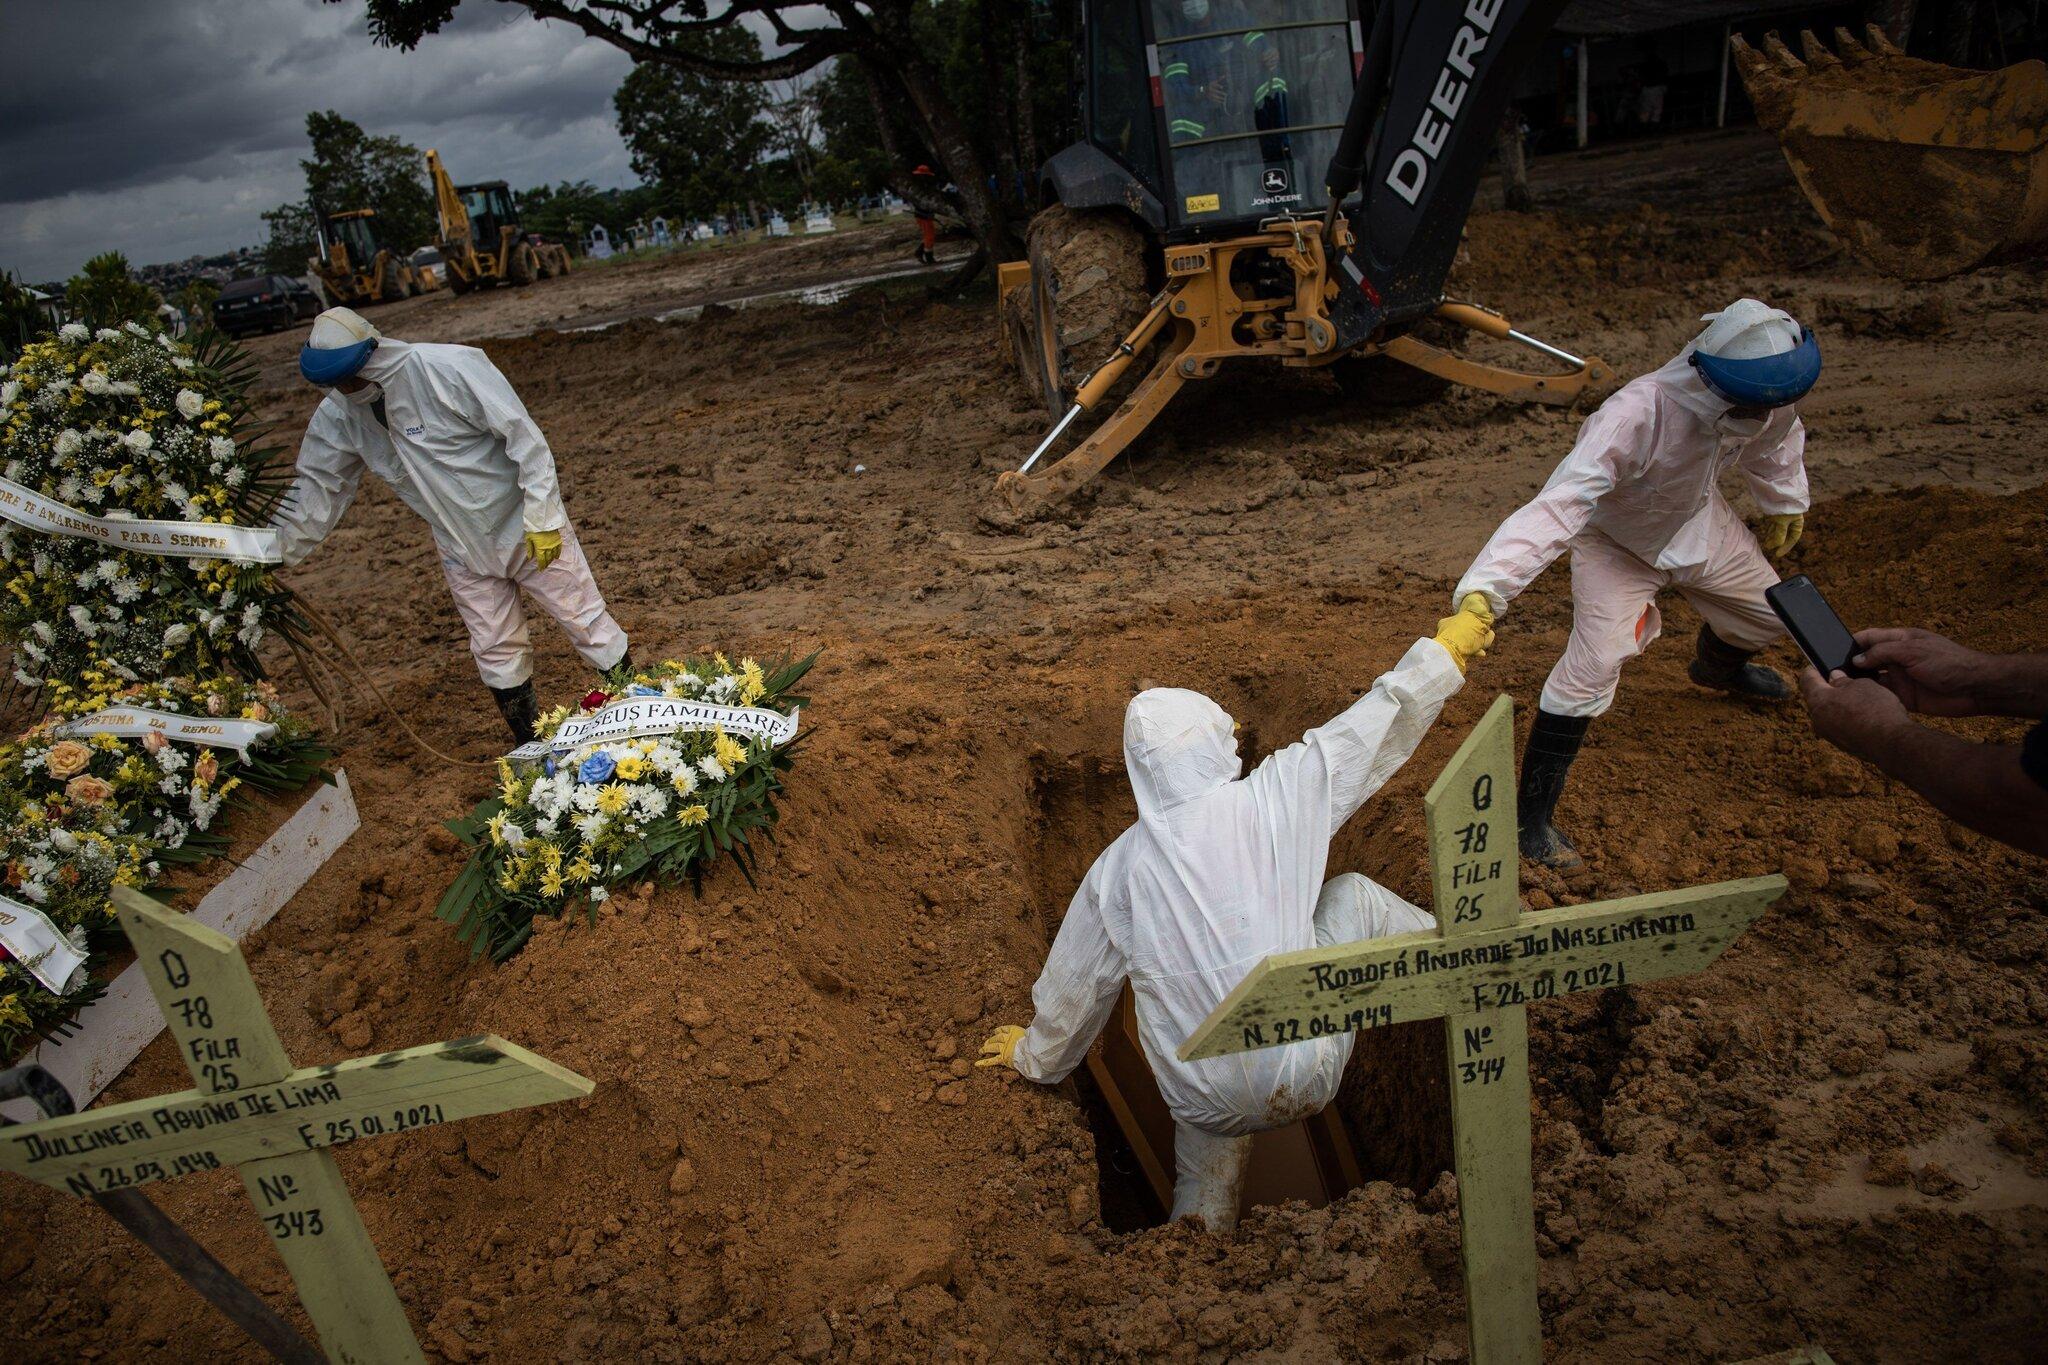 Mass grave in Brazil